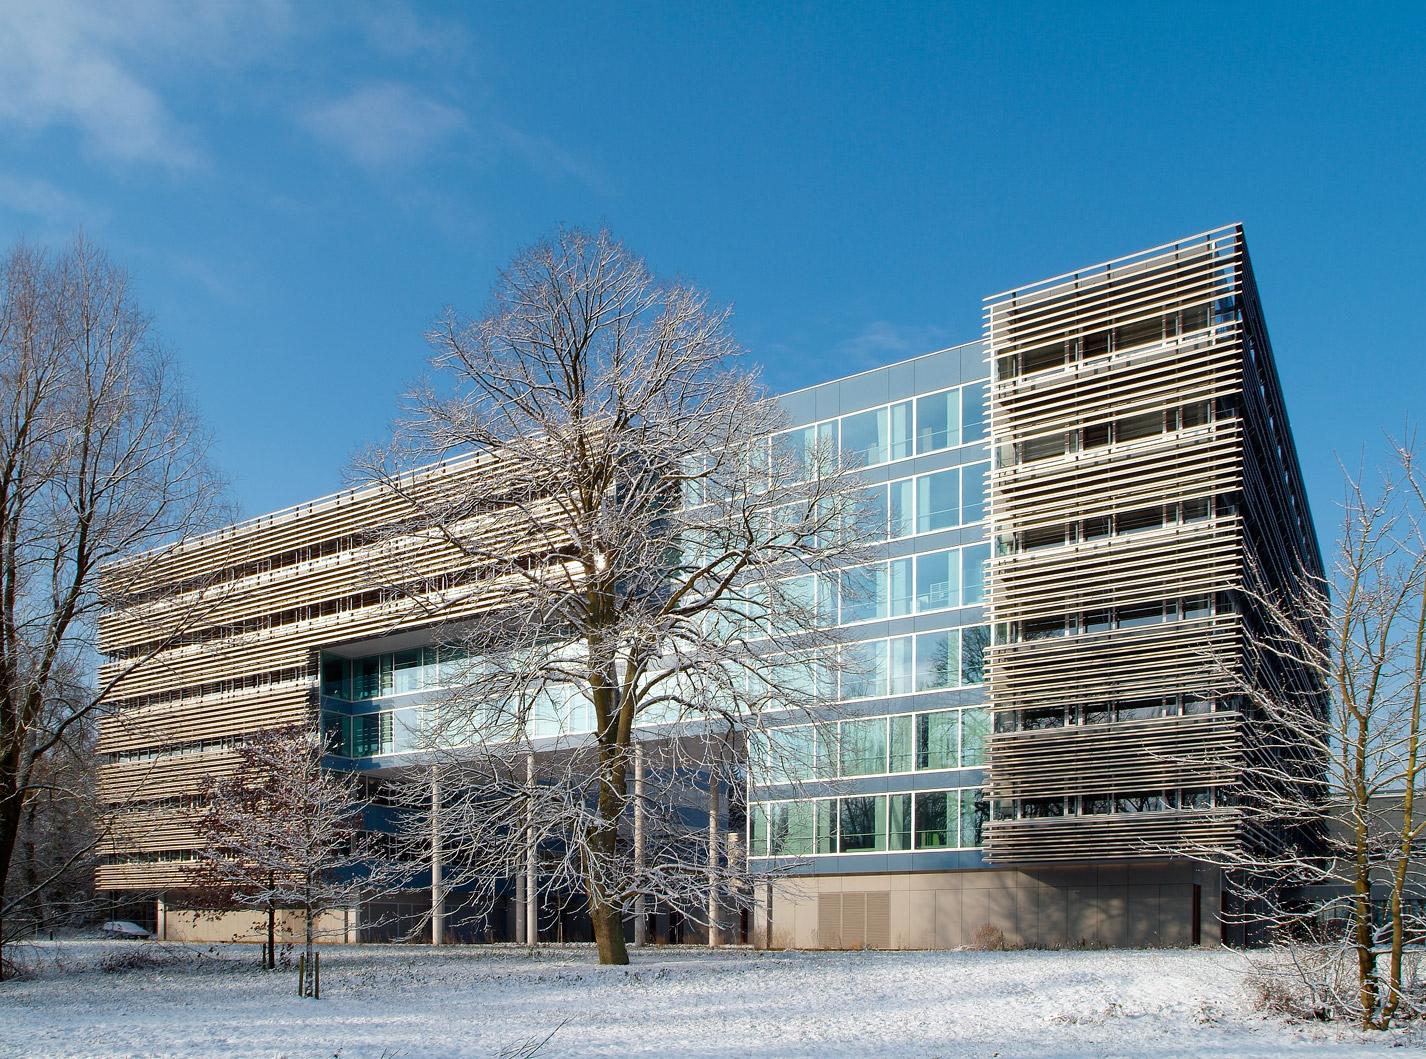 Belastingdienst Kantoor Rotterdam : Brieven belastingdienst vandaag